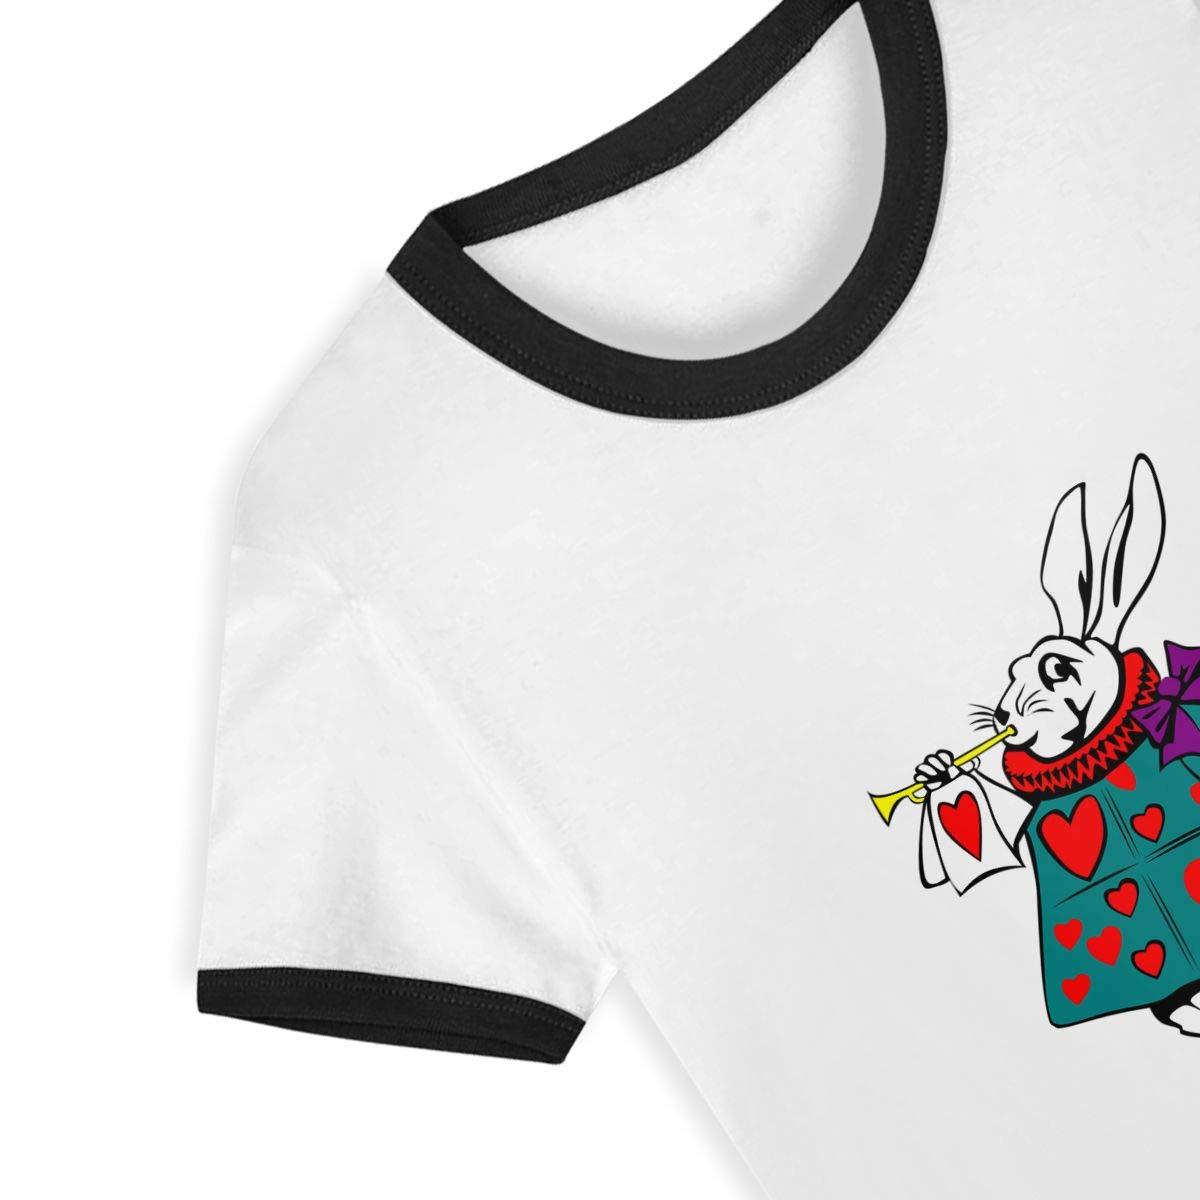 Rabbit in Wonder Land Summer Basic Childrens Short Sleeve Tee Short T Shirts